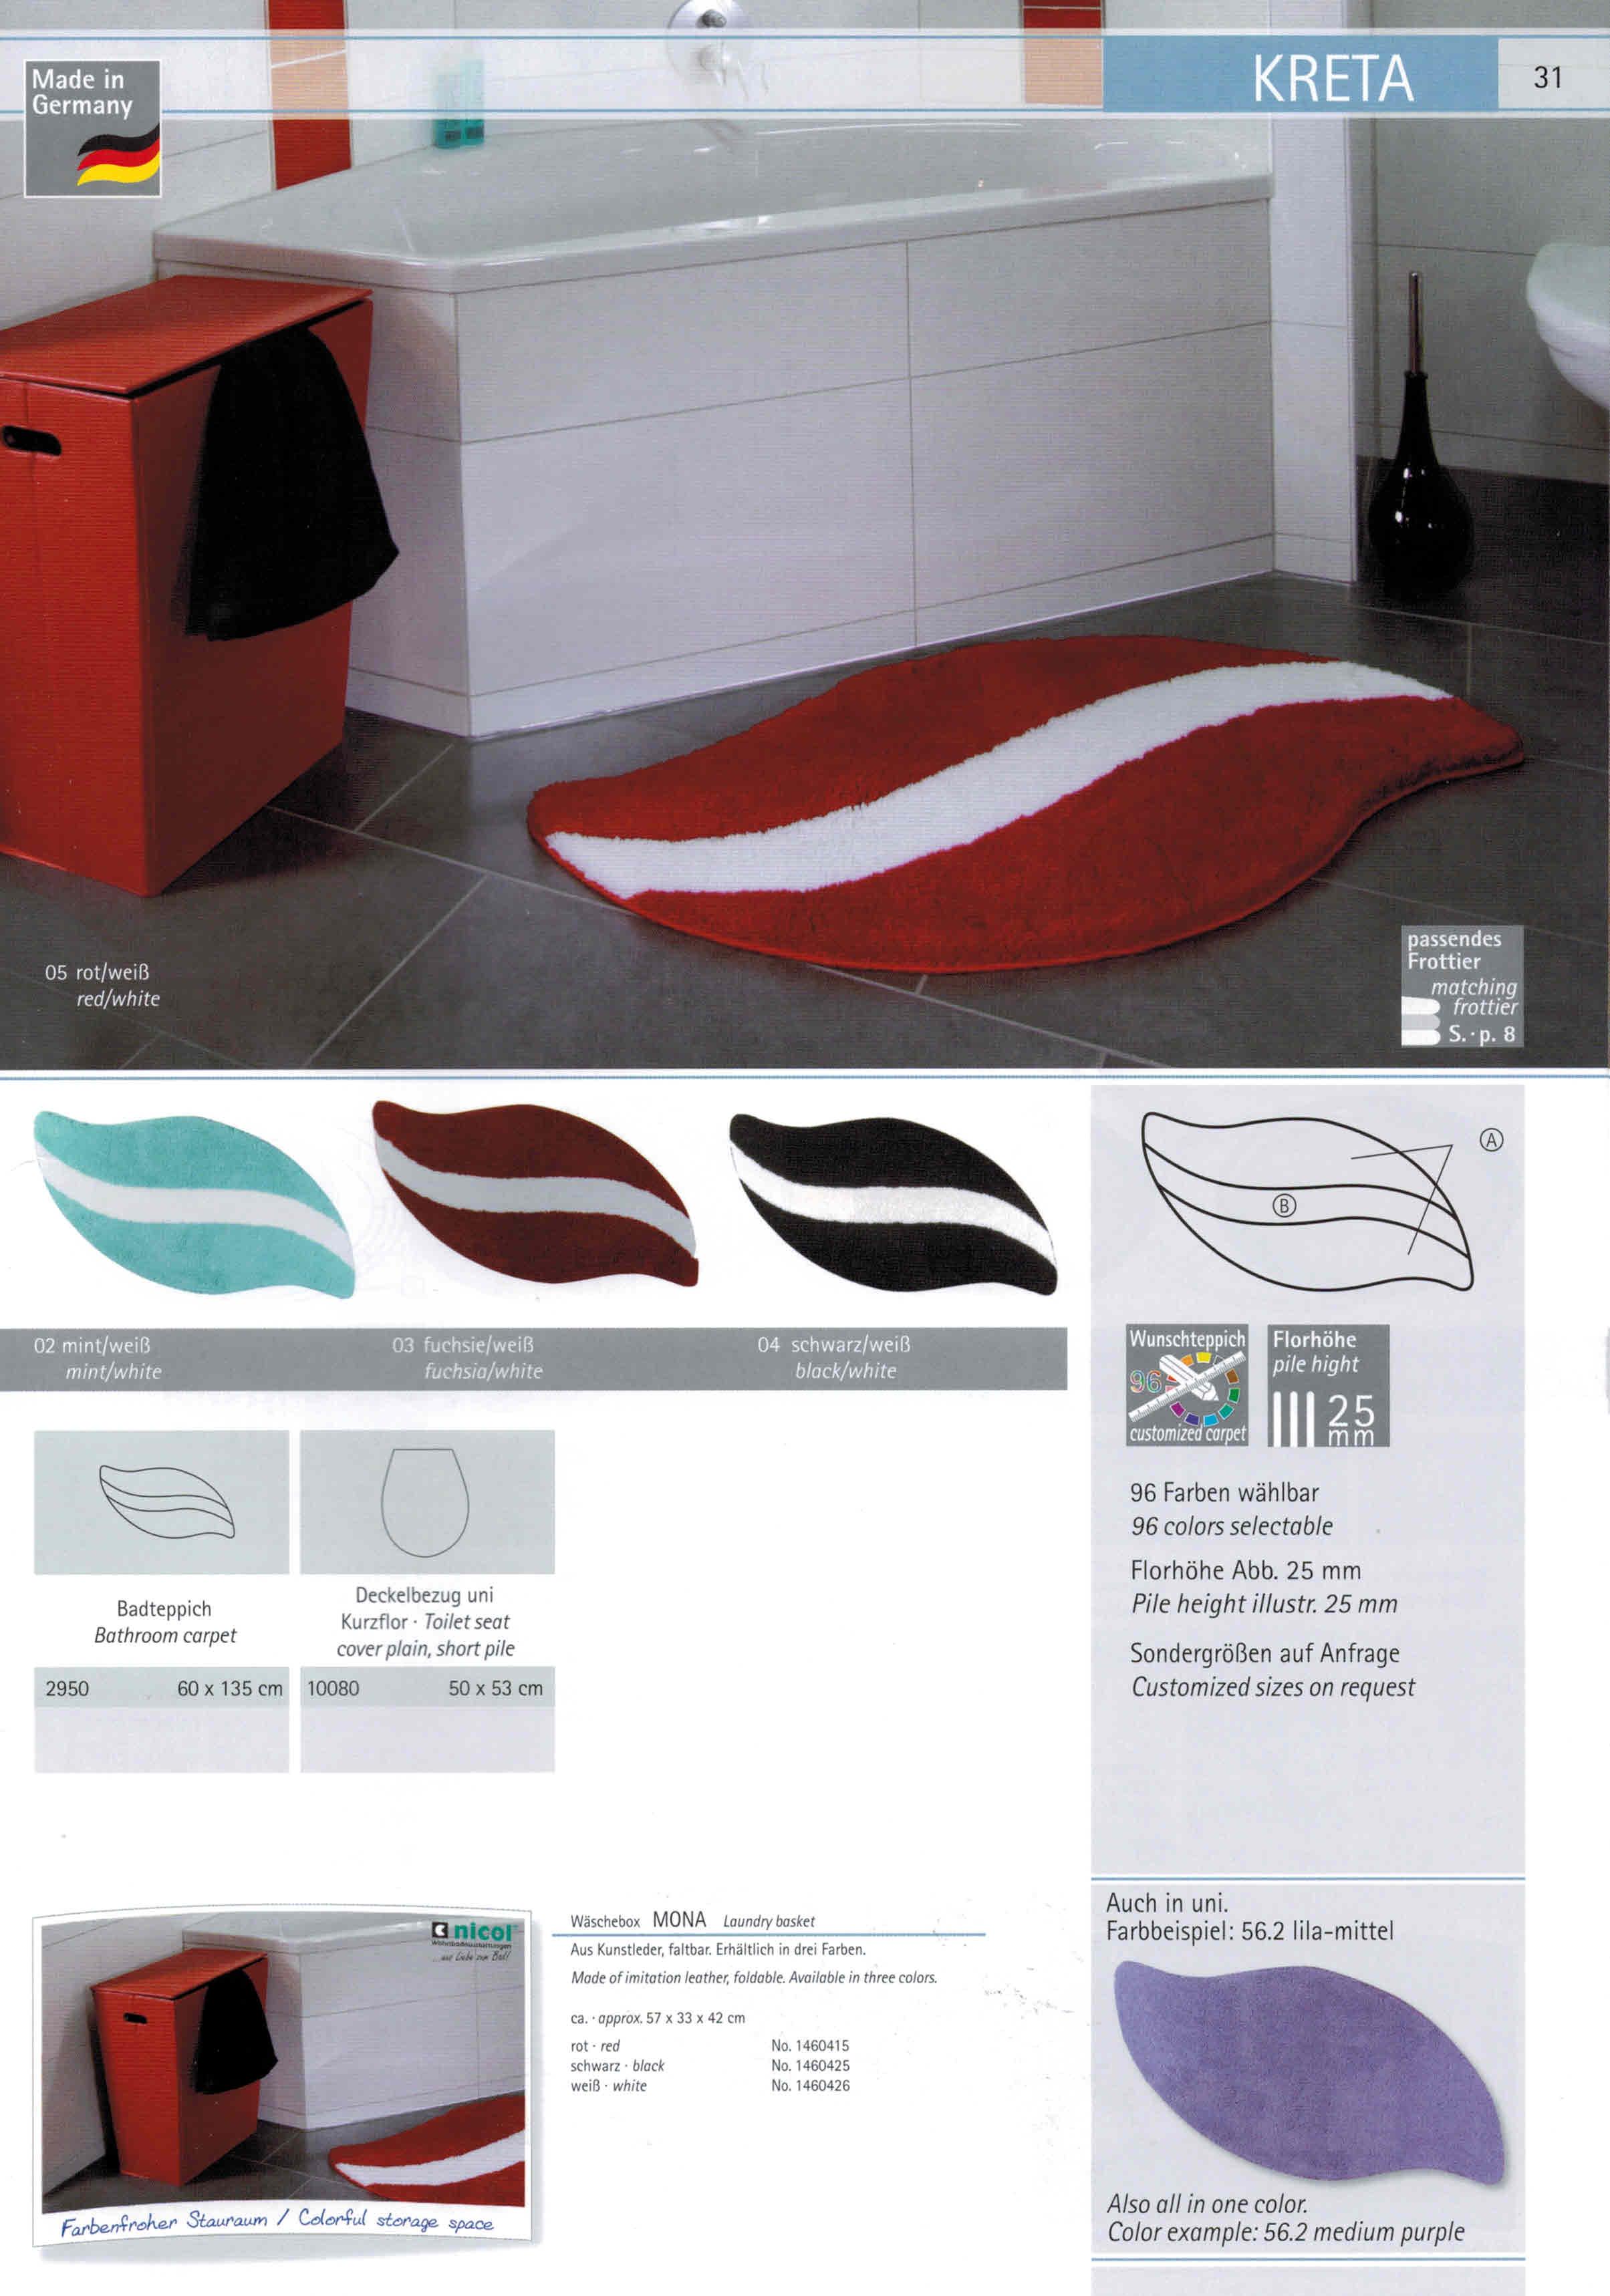 clarissa badteppich kreta badteppich nach ma inside53. Black Bedroom Furniture Sets. Home Design Ideas